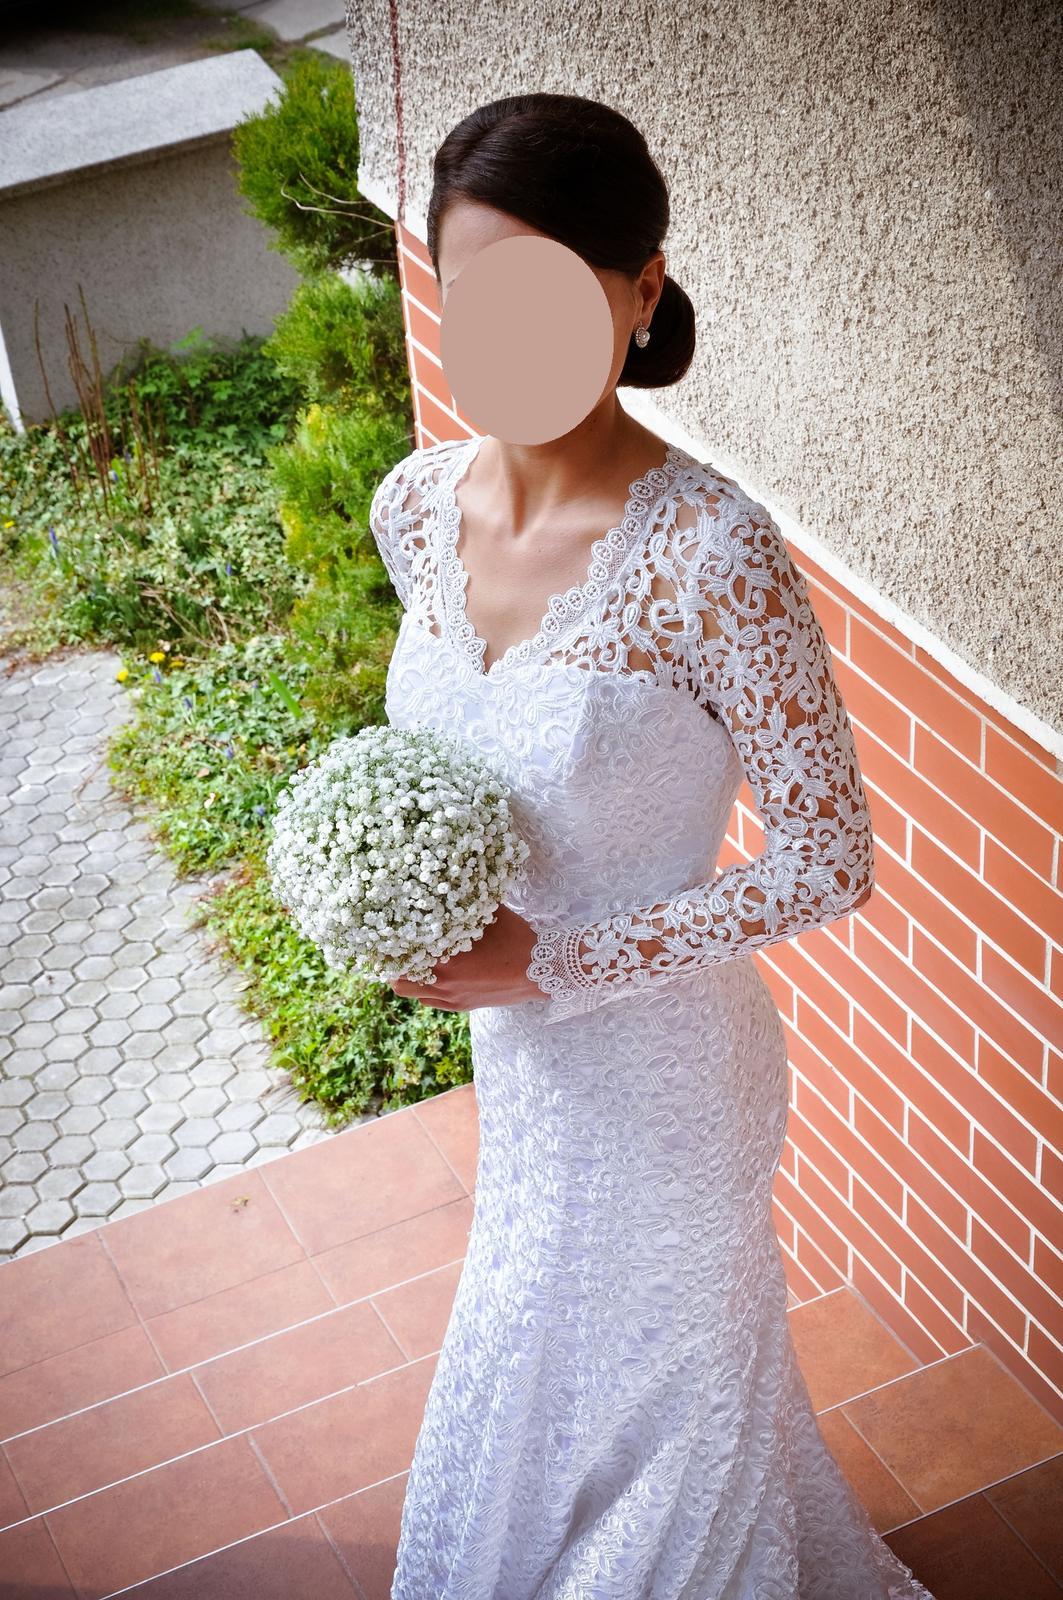 Luxusné krajkové šaty - Obrázok č. 4